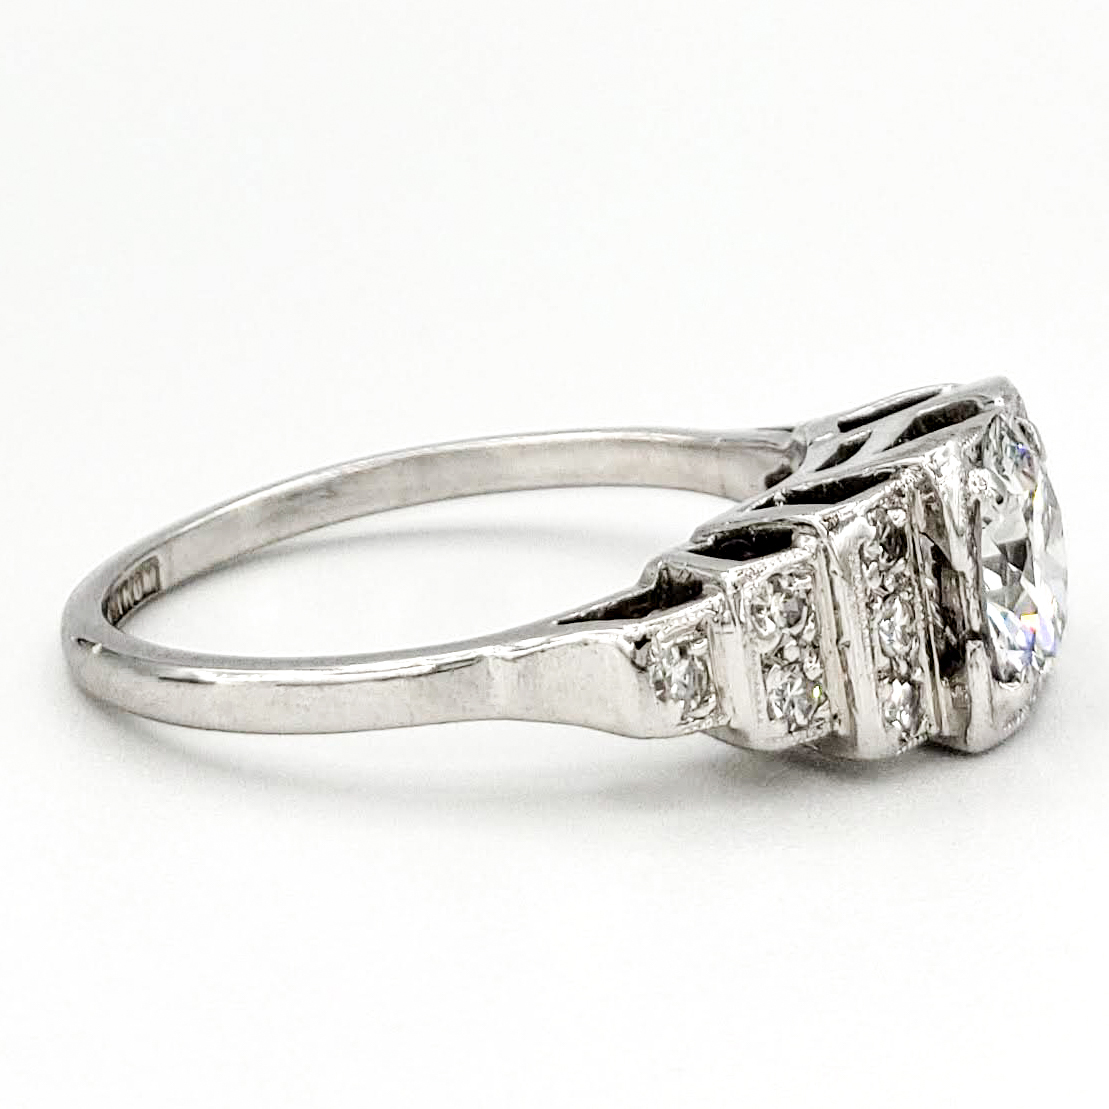 vintage-platinum-engagement-ring-with-0-88-carat-round-brilliant-cut-diamond-gia-e-vs1